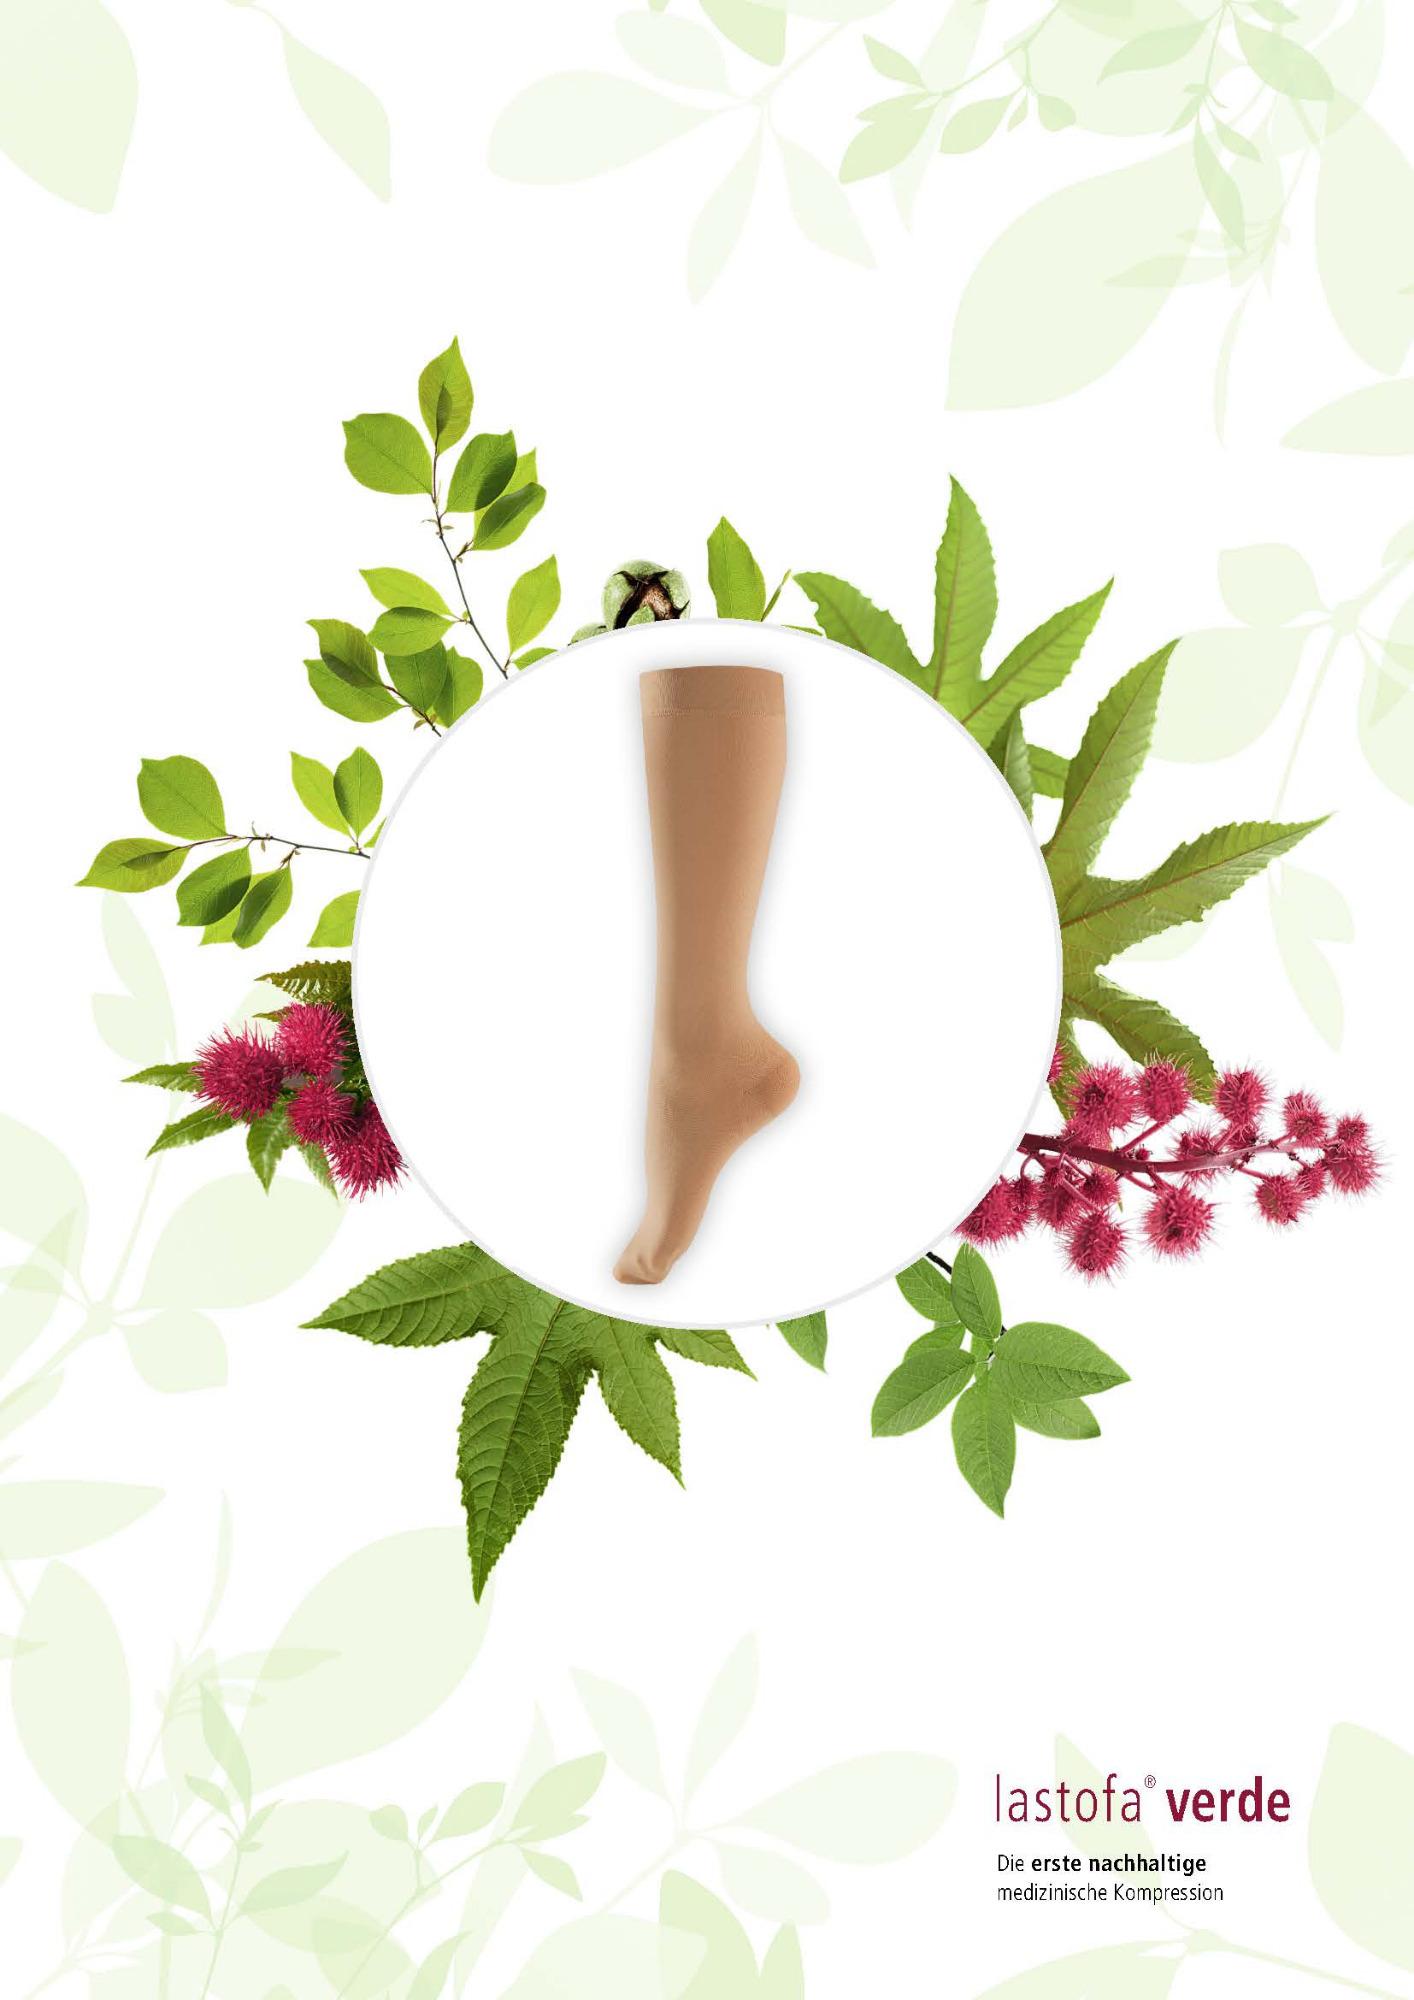 lastofa_verde_strumpf-mit-pflanzen_logo_